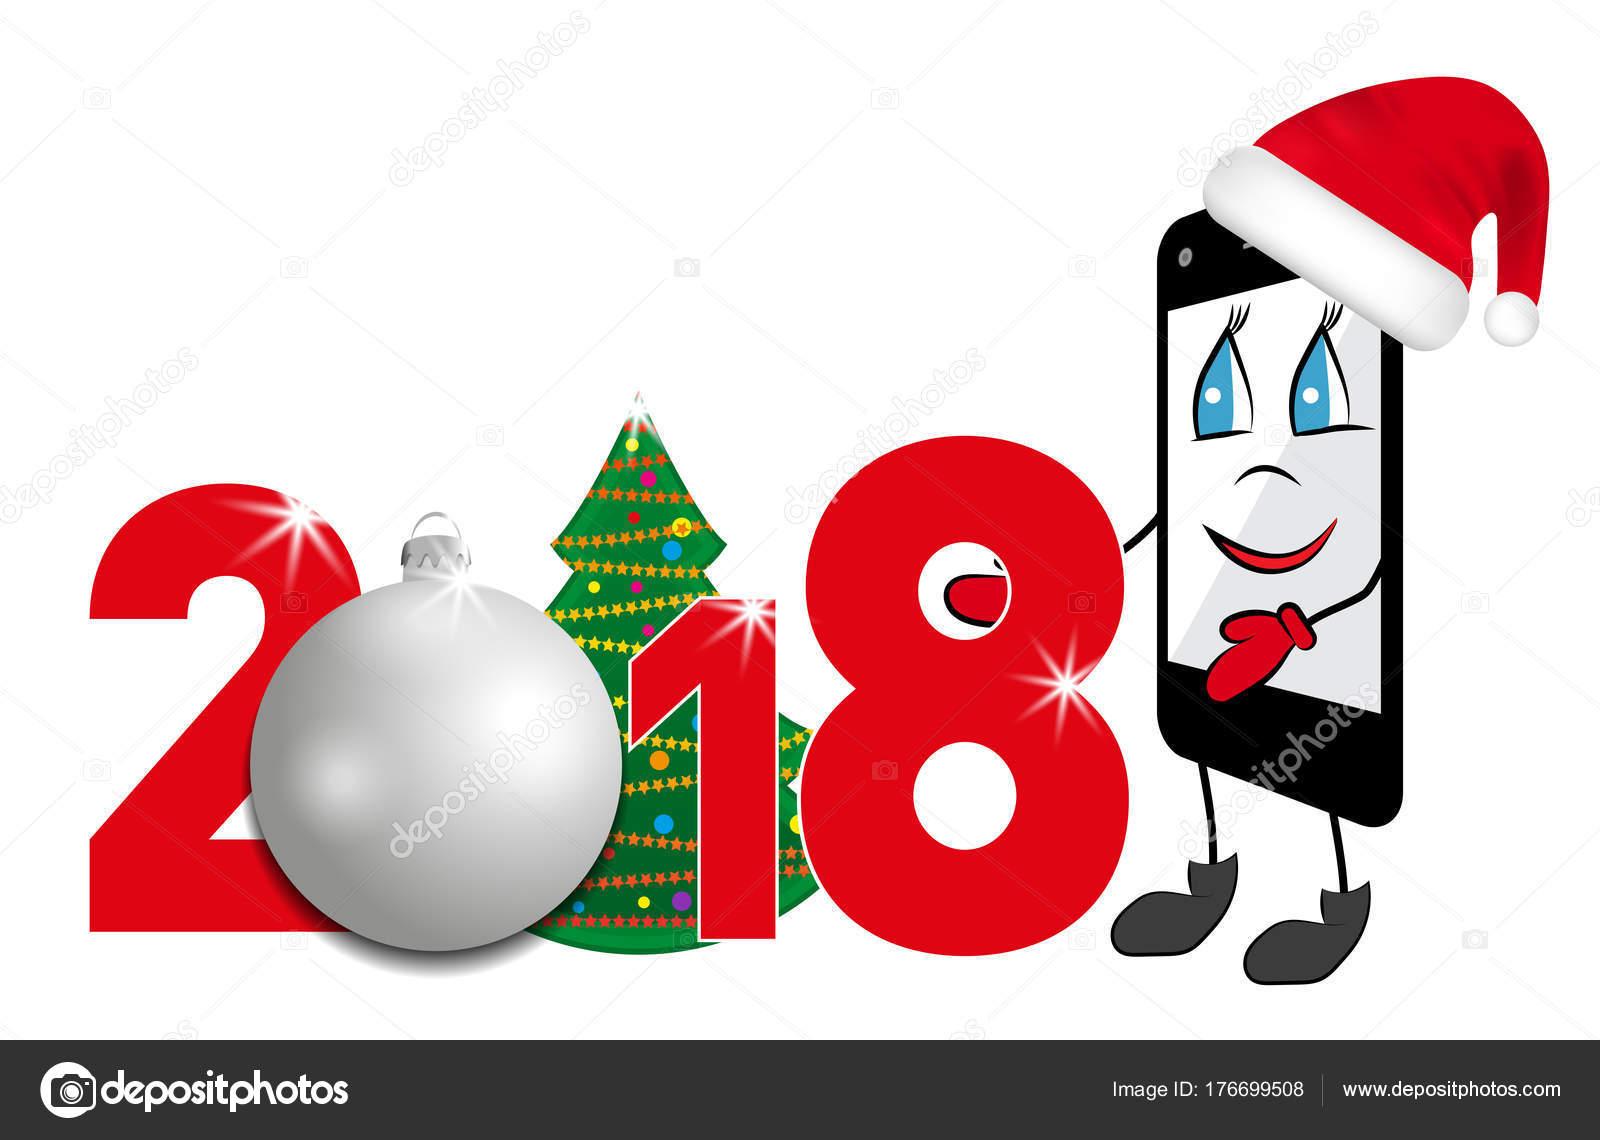 noel 2018 smartphone Dessin animé Smartphone au chapeau rouge de père Noël. 2018 numéro  noel 2018 smartphone